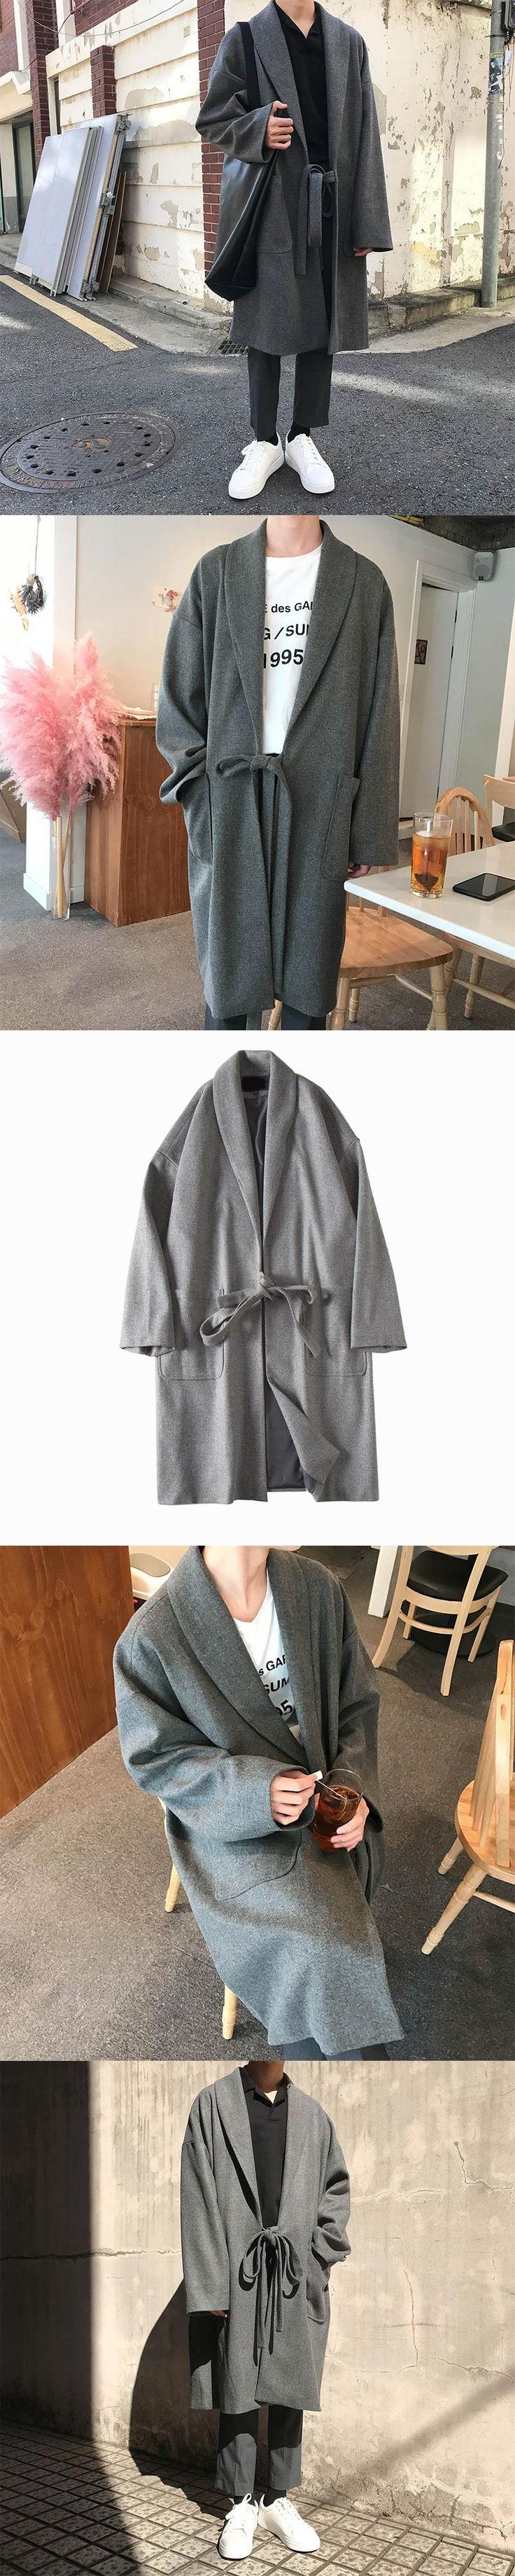 Fashion Winter 2017 Gray Long Coats Chalaza Wool Jacket Woolen New Overcoat Sobretudo Masculino Trench Casual Large Casaco Men